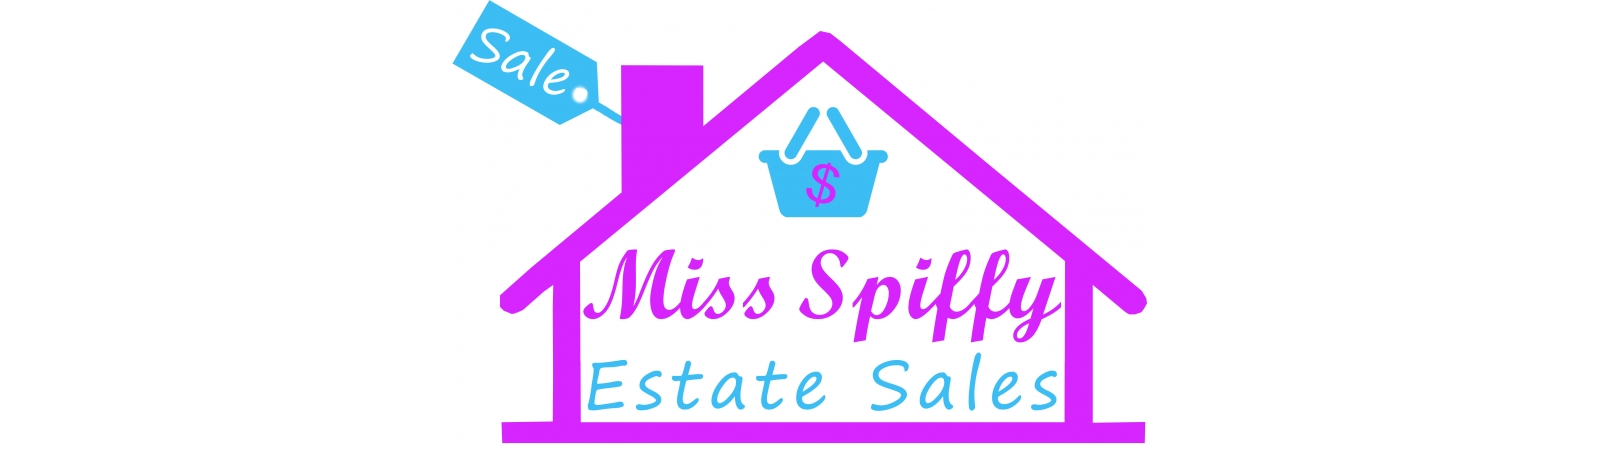 Miss Spiffy Estate Sales, LLC | Auction Ninja